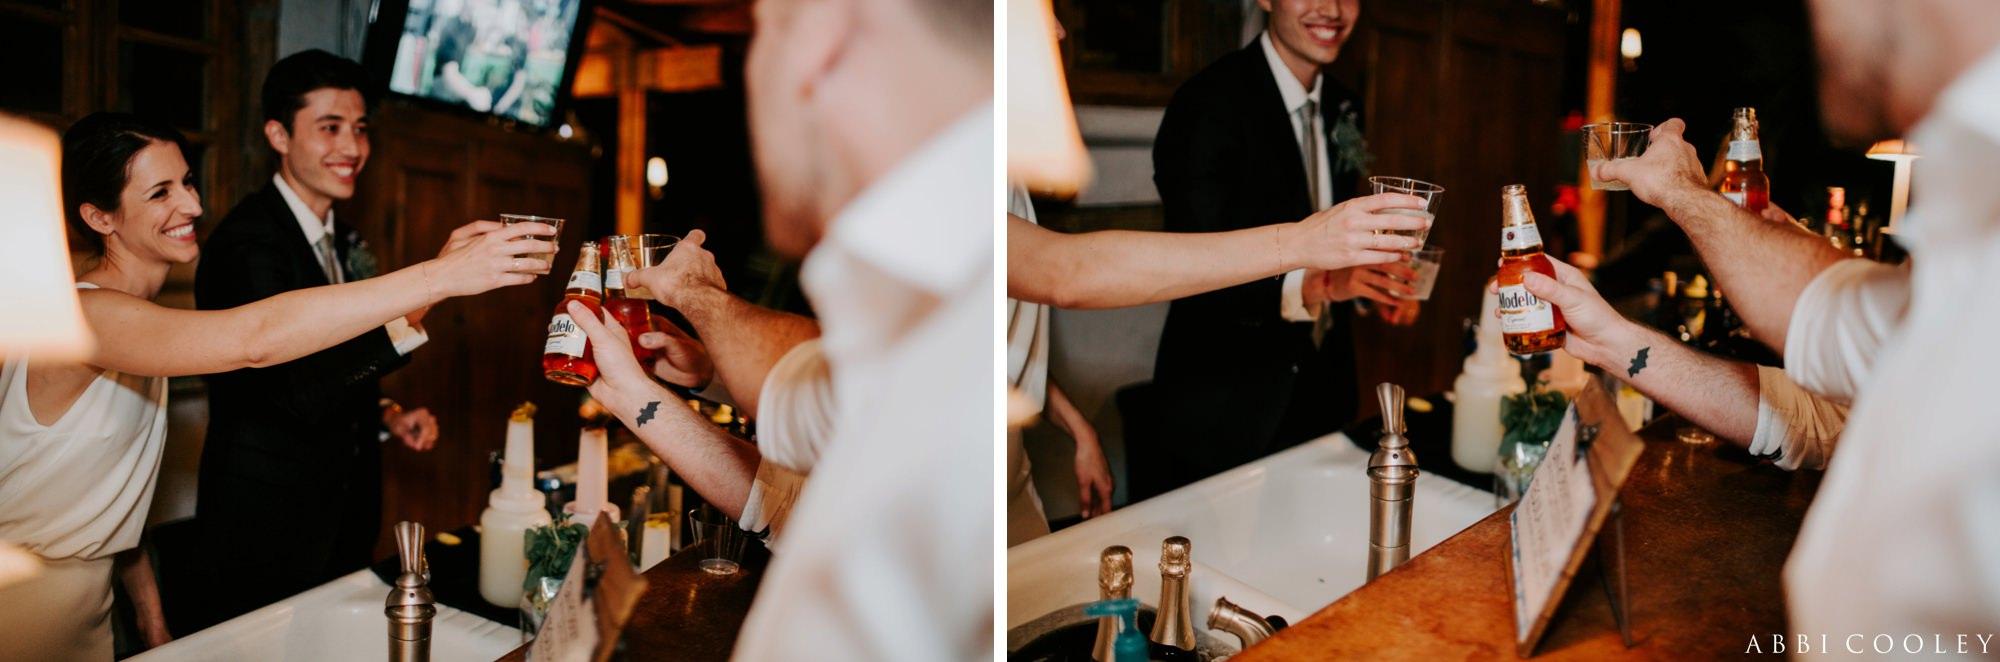 ABBI COOLEY PALM SPRINGS WEDDING_0827